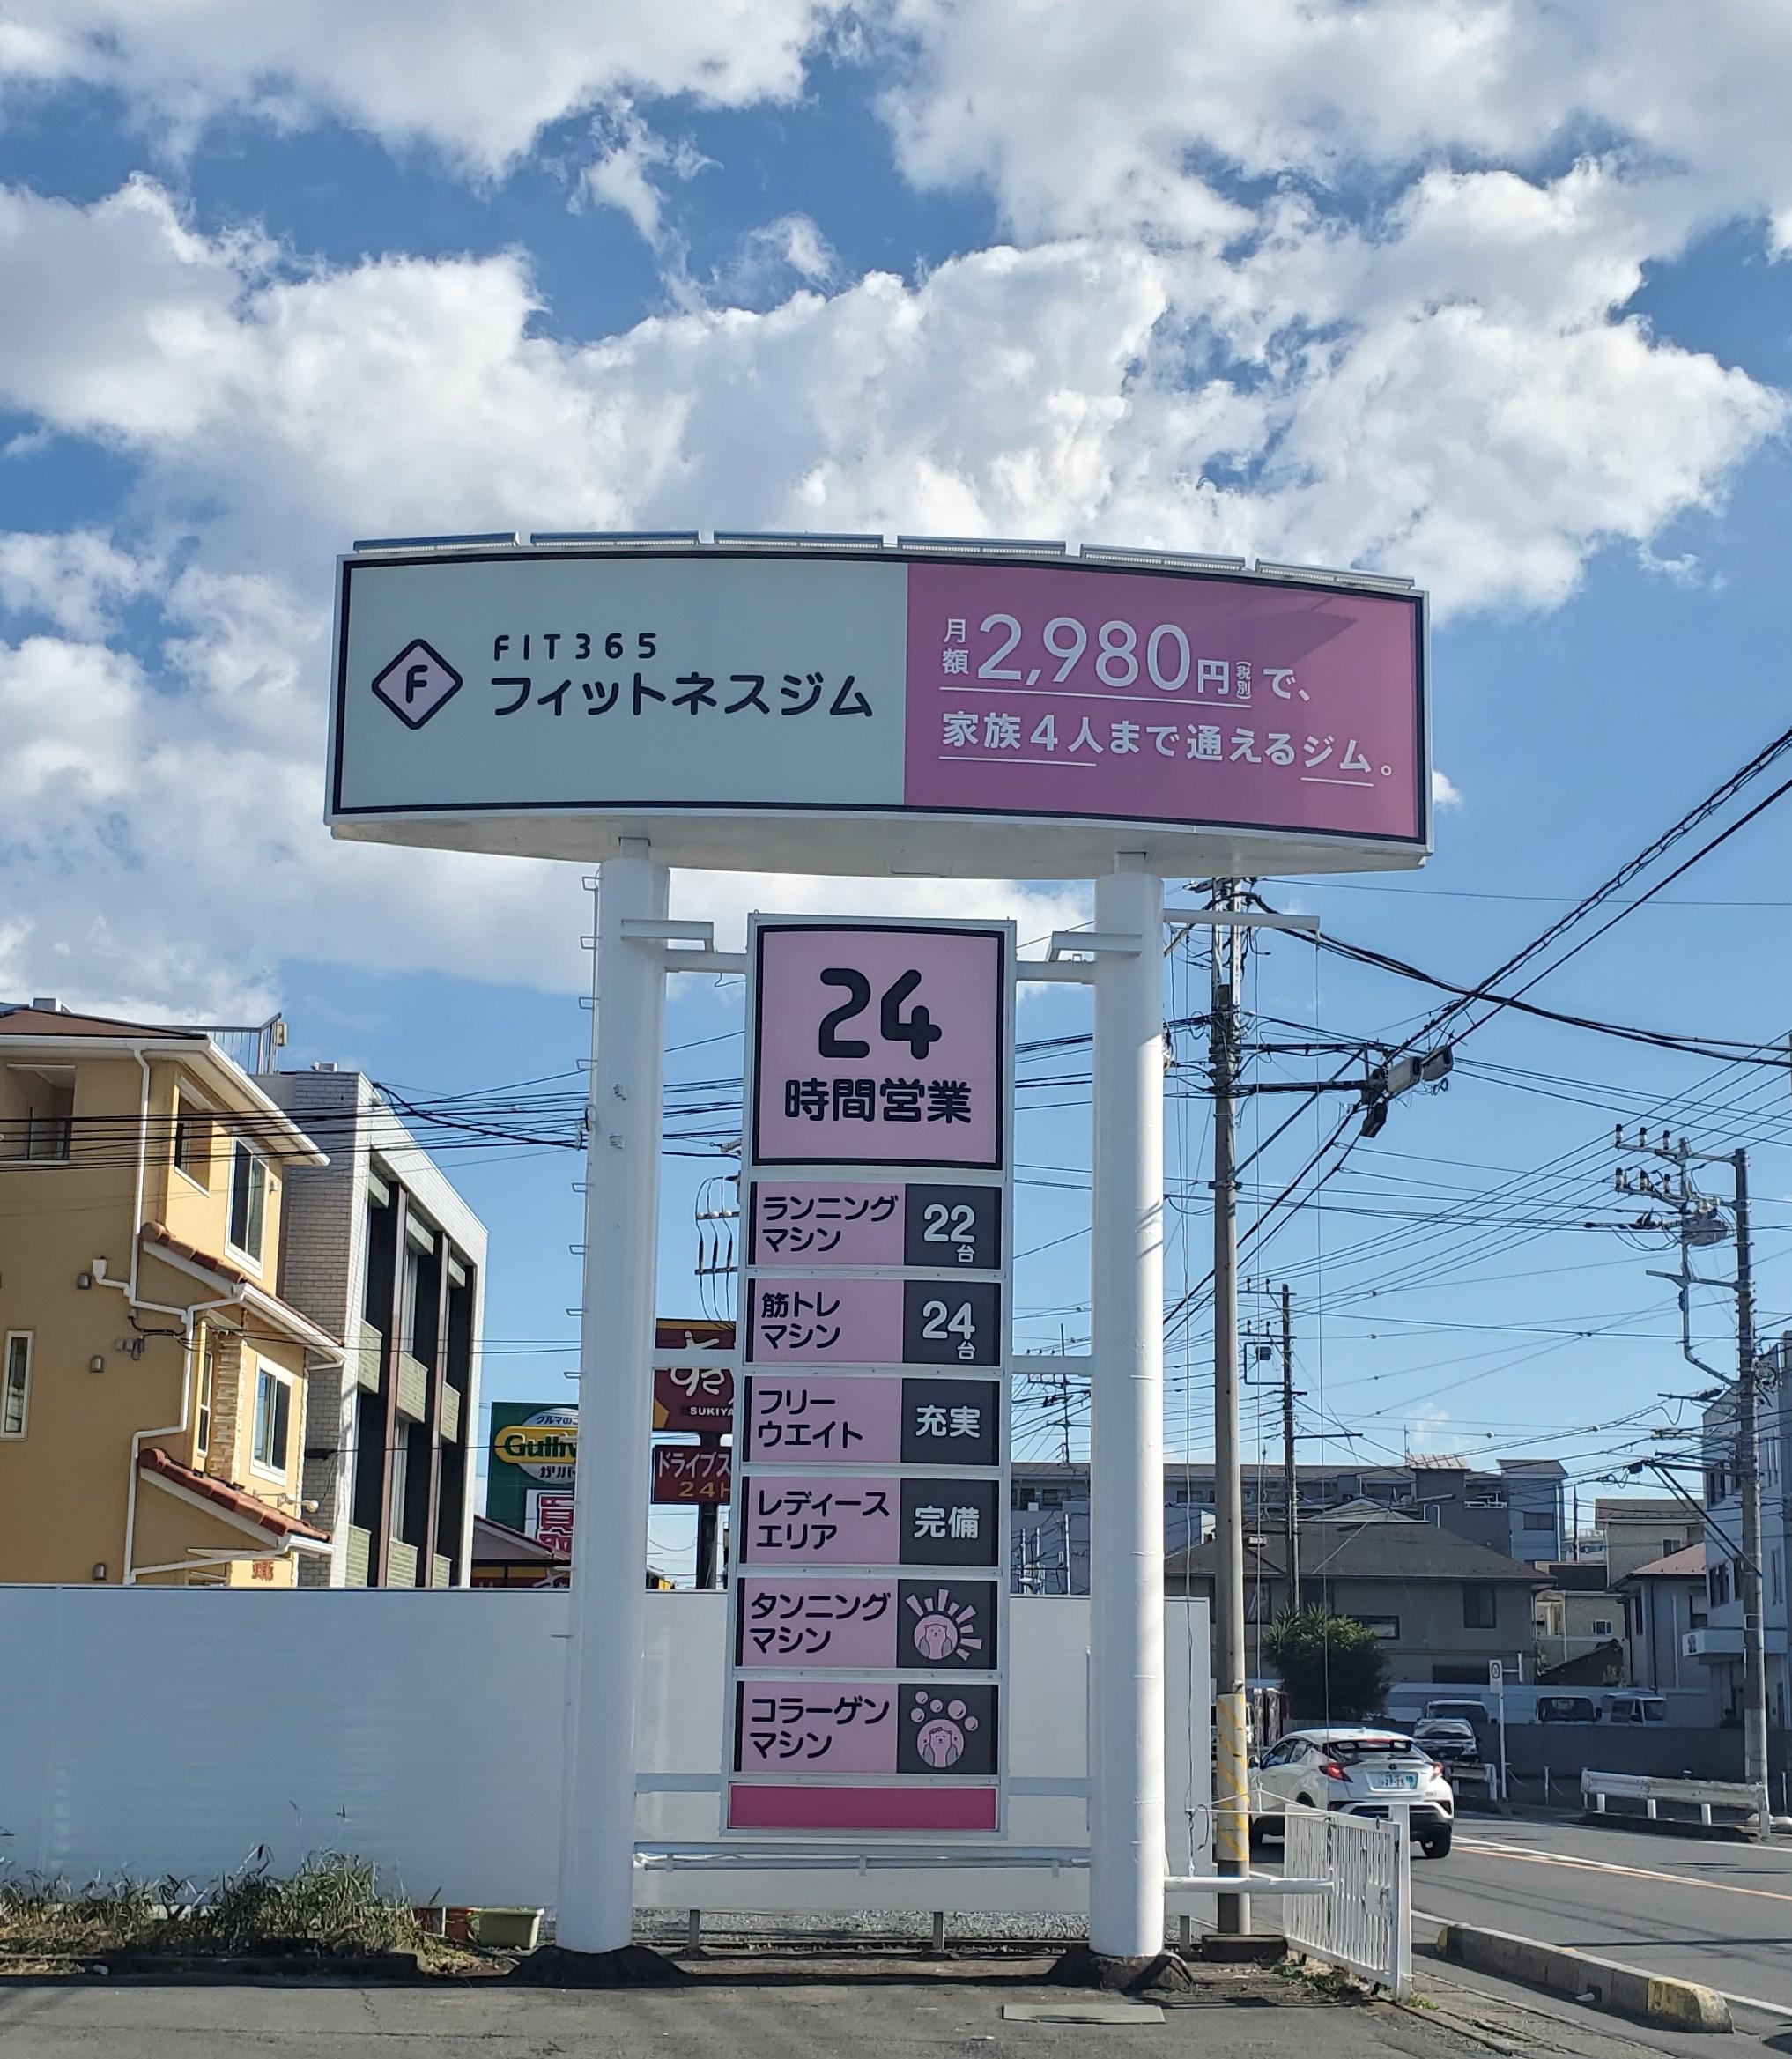 FIT365 浦和太田窪